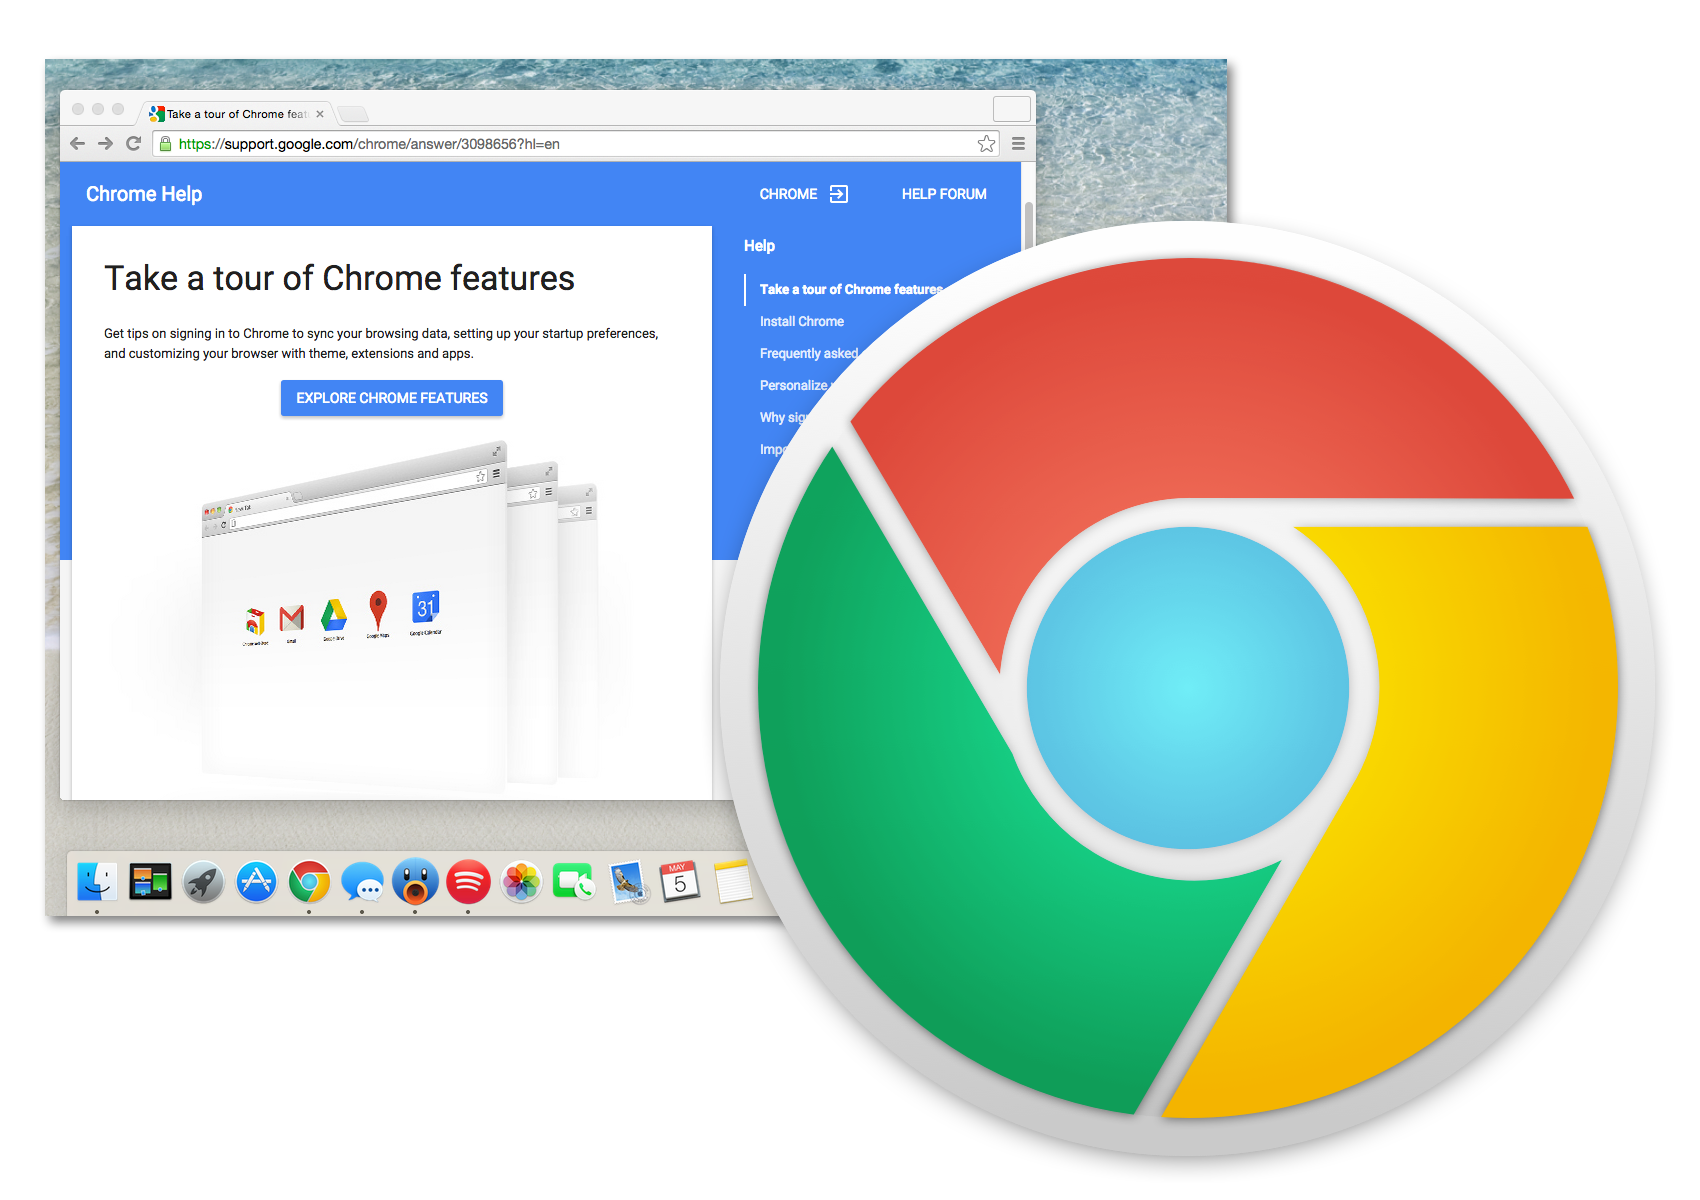 Google chrome themes yosemite -  Chrome For Yosemite Work In Progress By Aviatorgamer